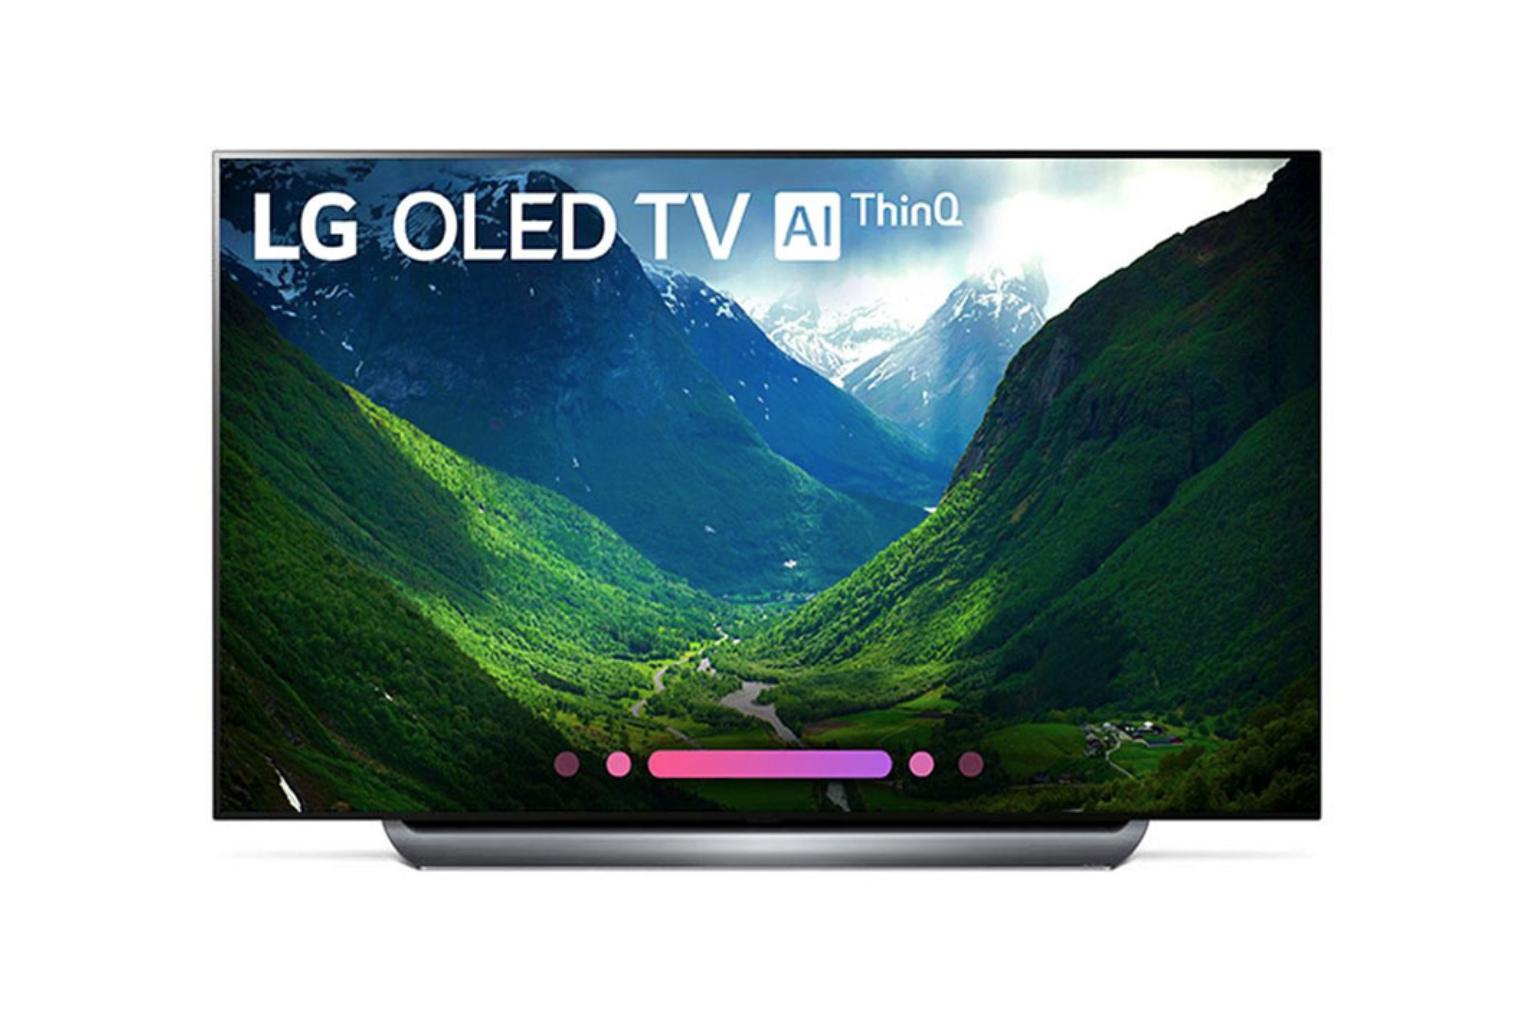 LG C8 OLED 55